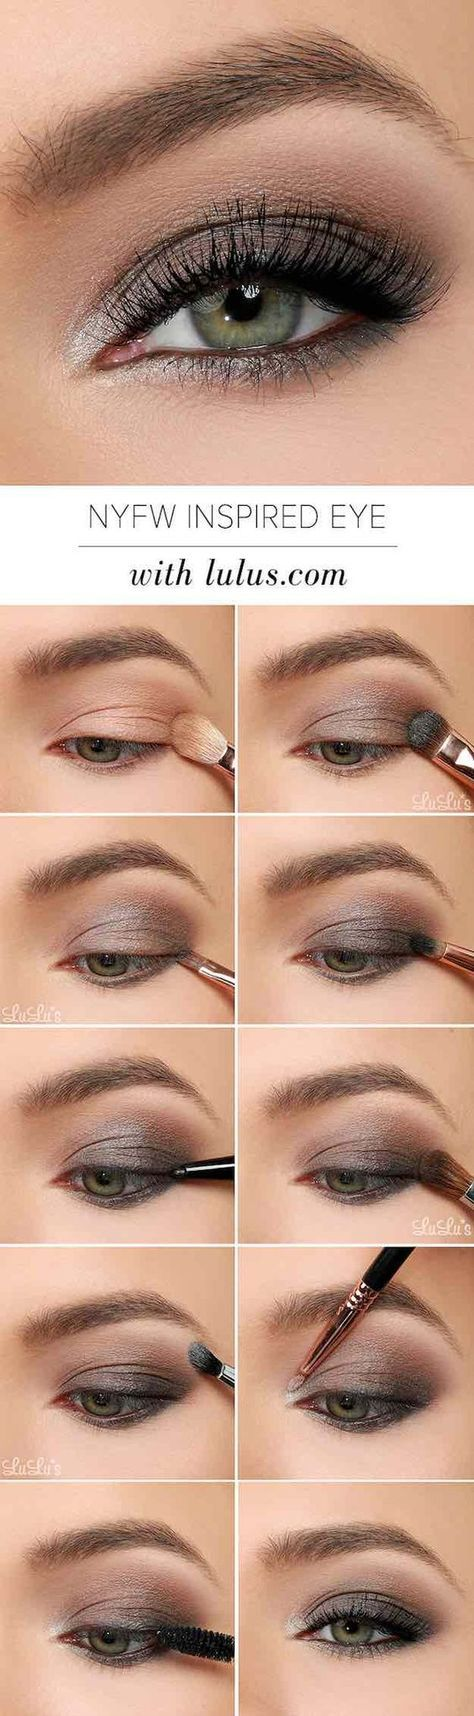 Best 25 Makeup For Green Eyes Ideas On Pinterest